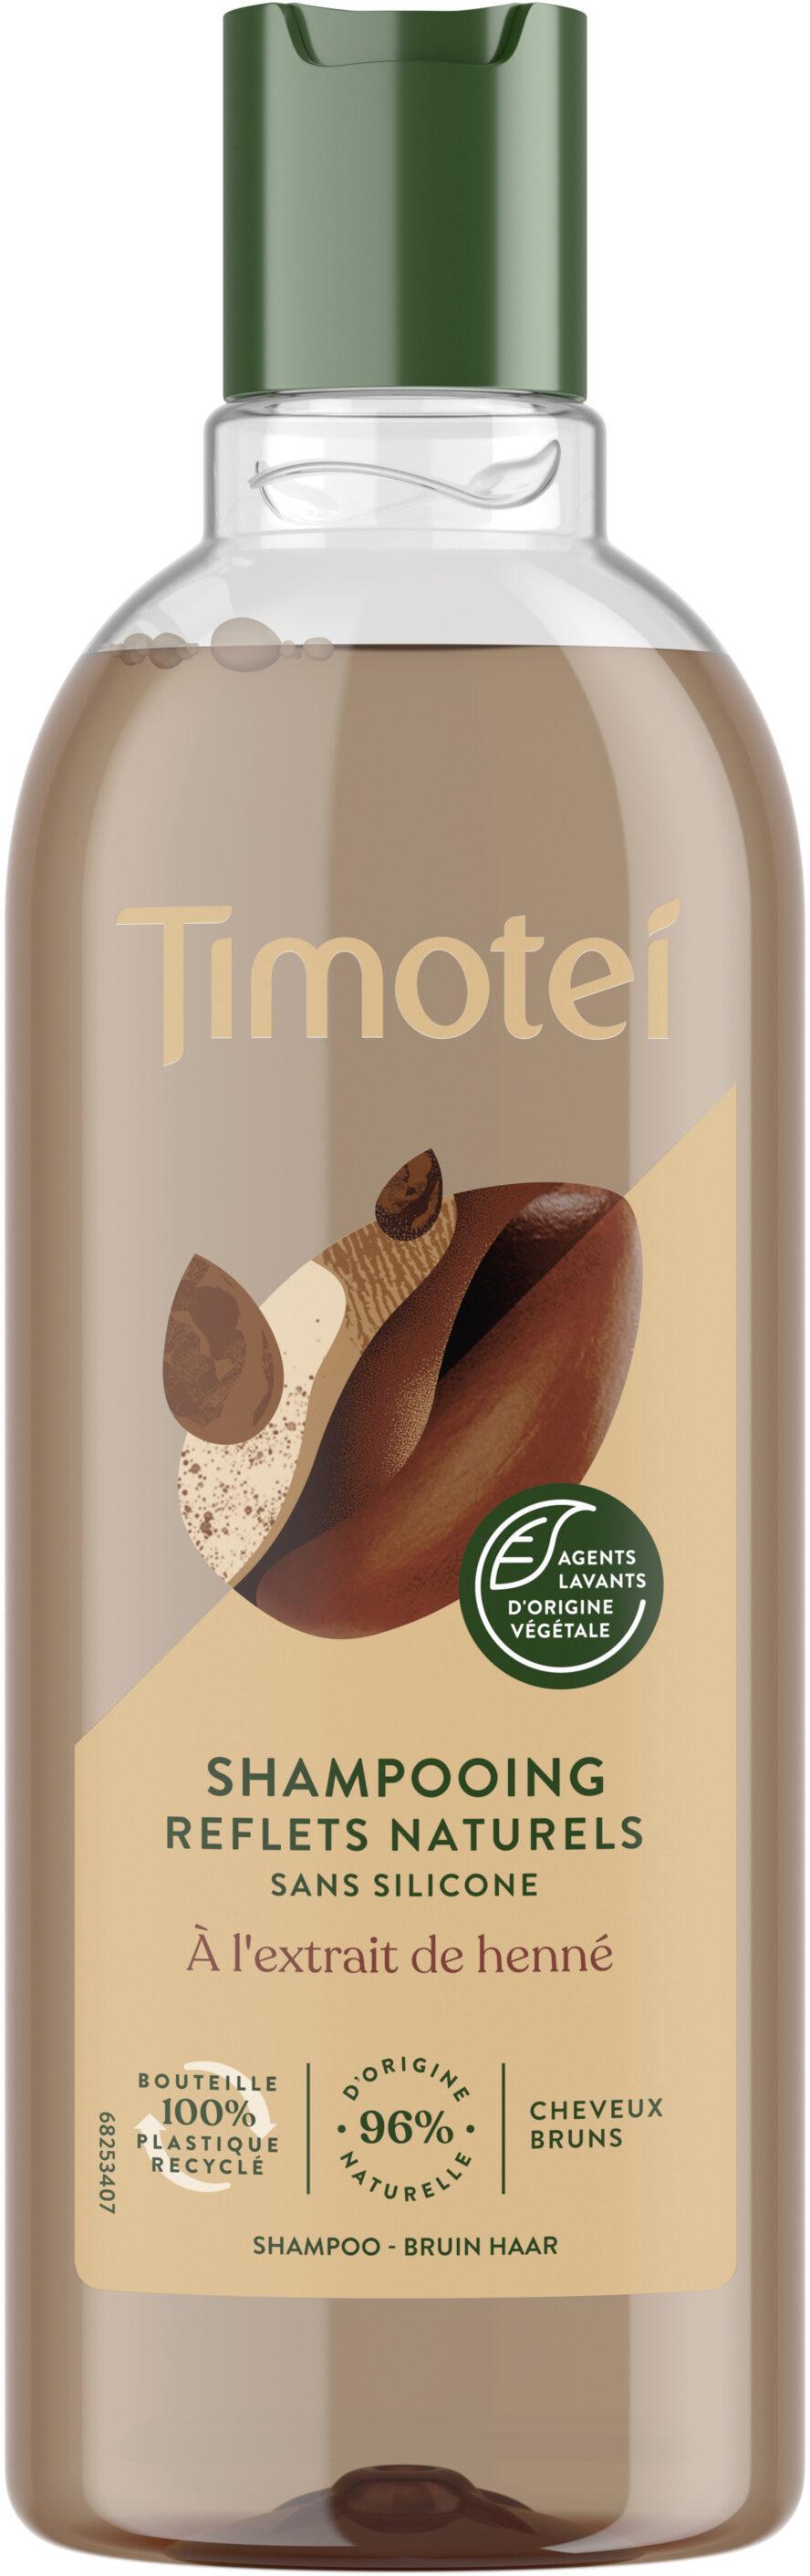 Timotei Shampooing Femme Reflets Naturels - Product - fr